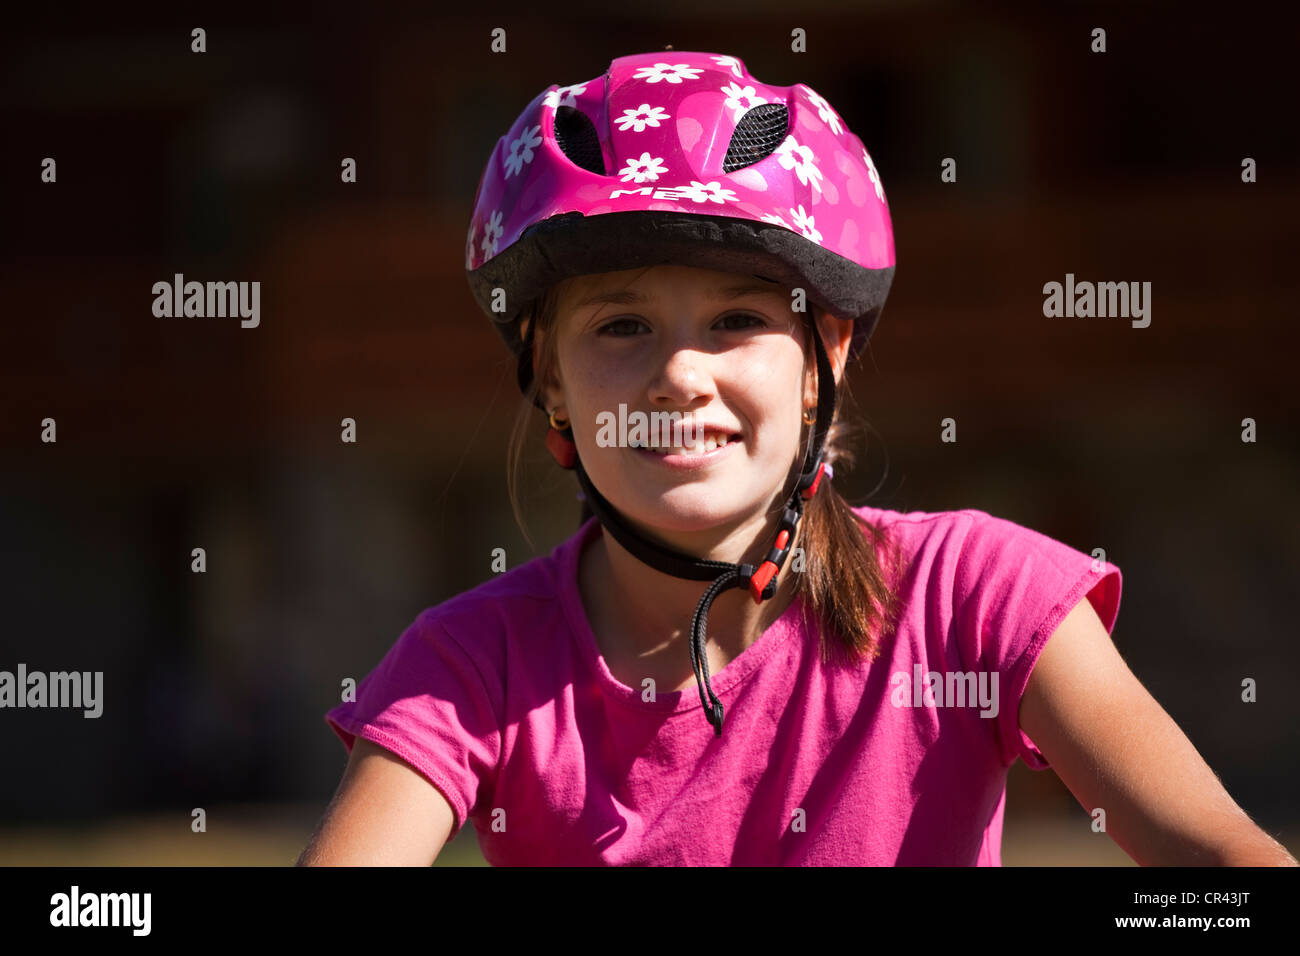 France, Savoie, Valmorel, portrait with mountain bike gear - Stock Image